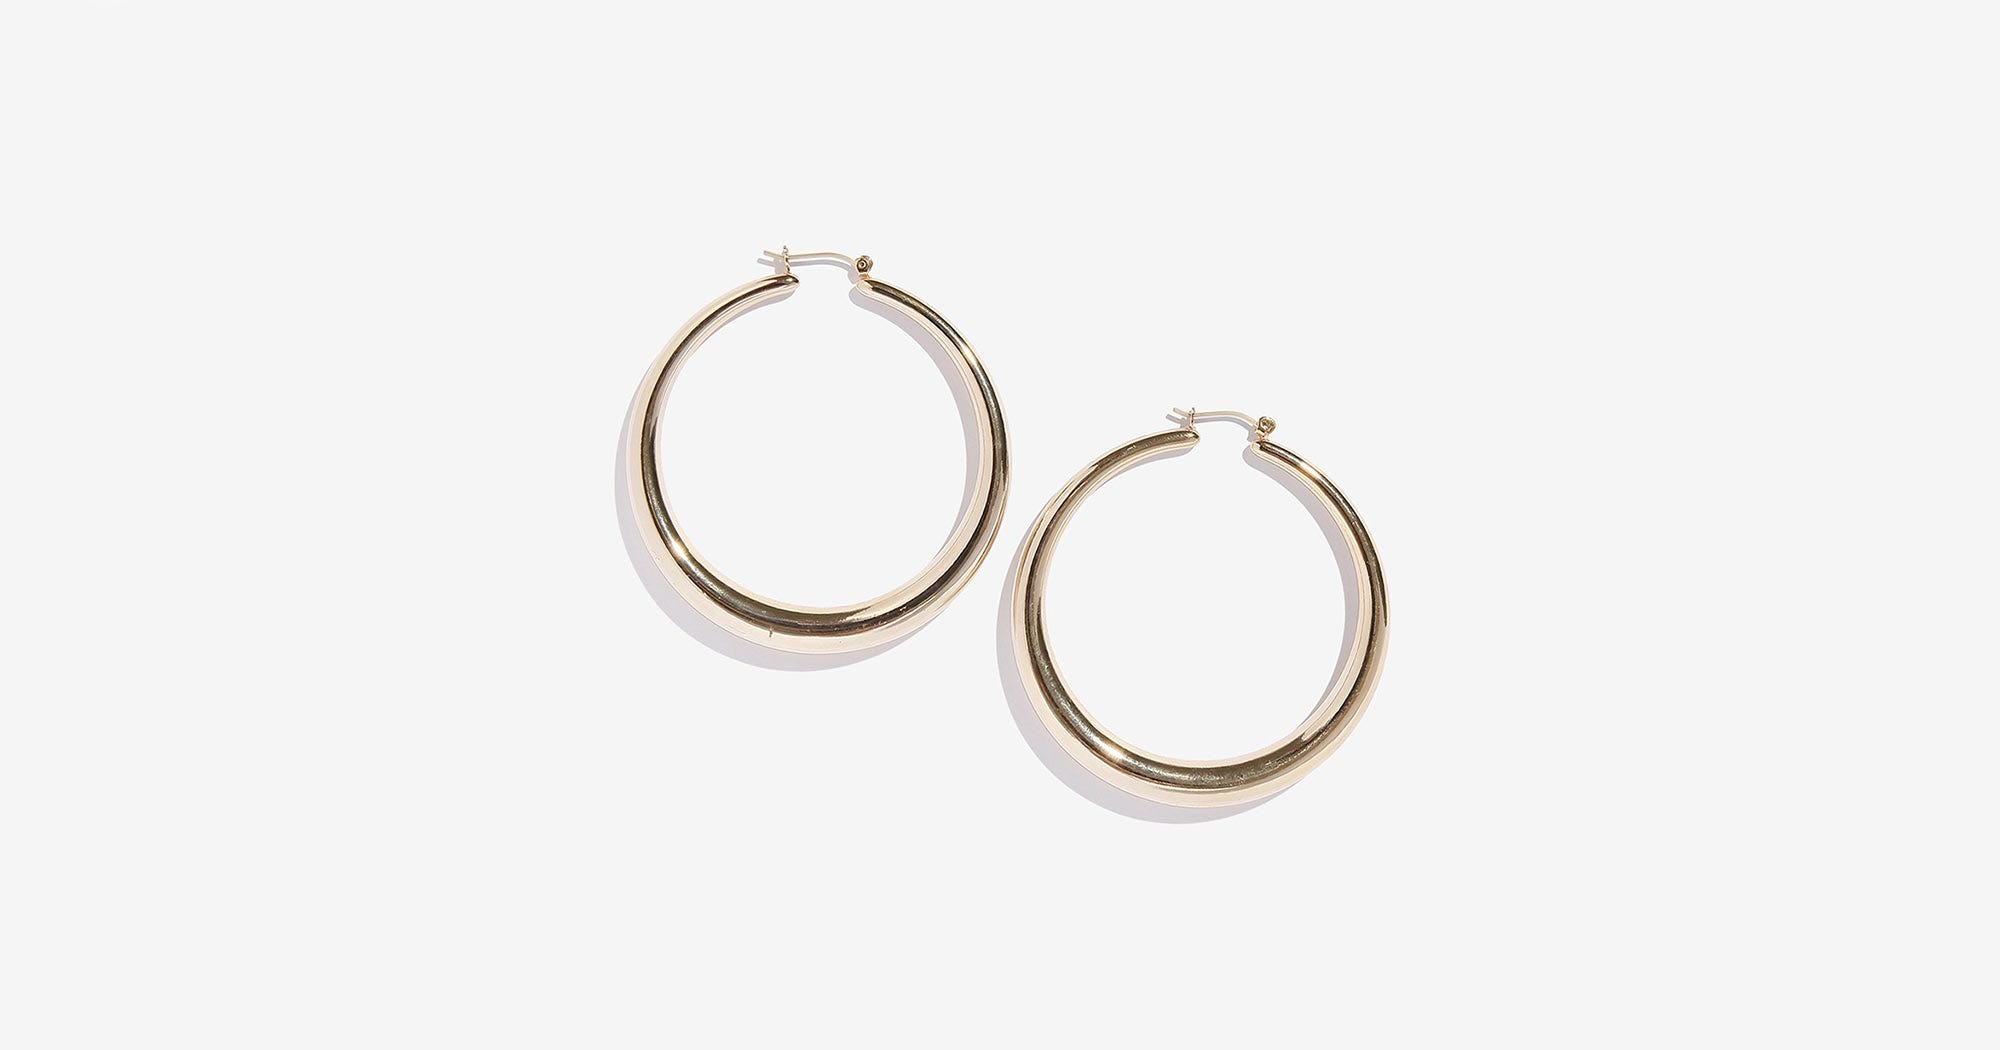 Affordable Hoop Earrings Adornmade Kylie Jenner